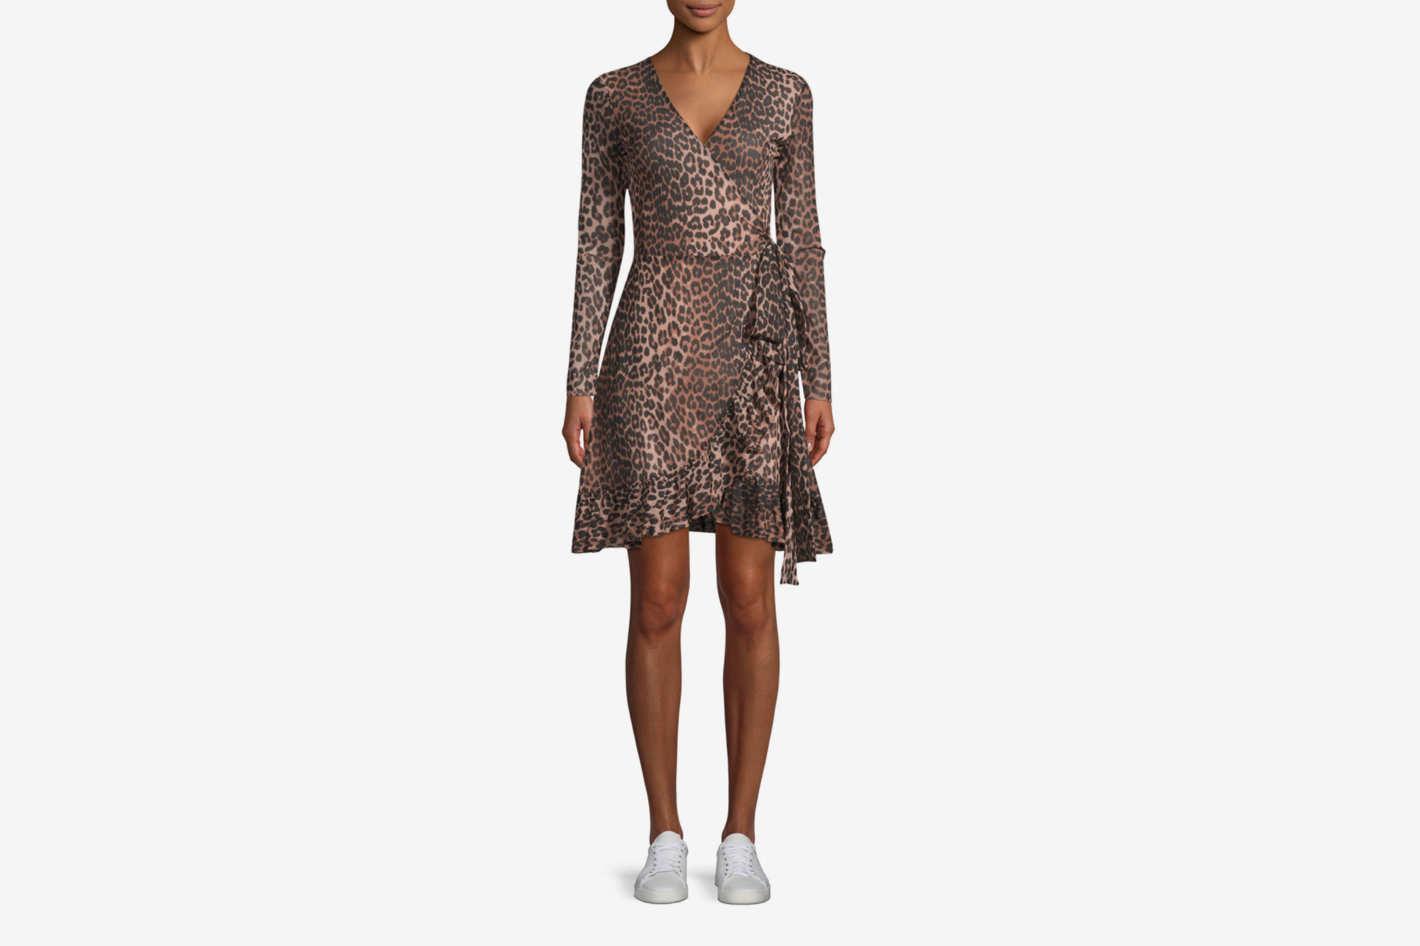 Ganni Tilden Mesh Leopard Print Dress